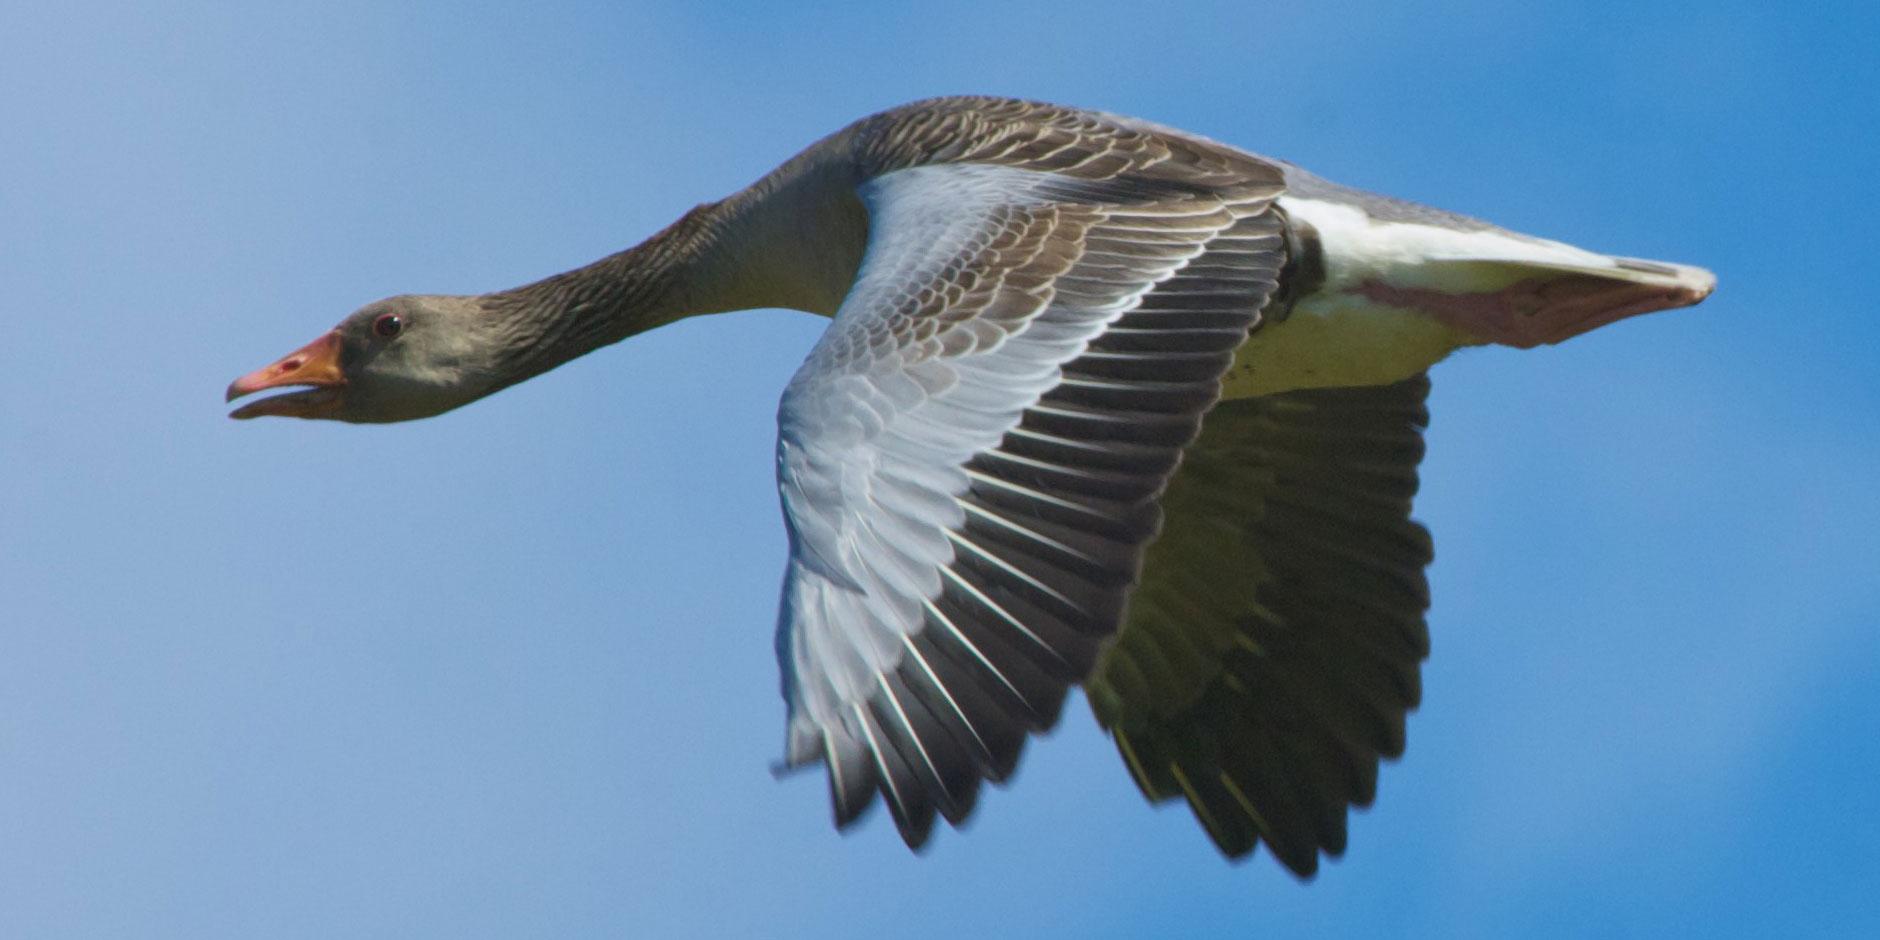 Islay is one of Scotland's top ornithological destinations Original image courtesy Benoit Plumat